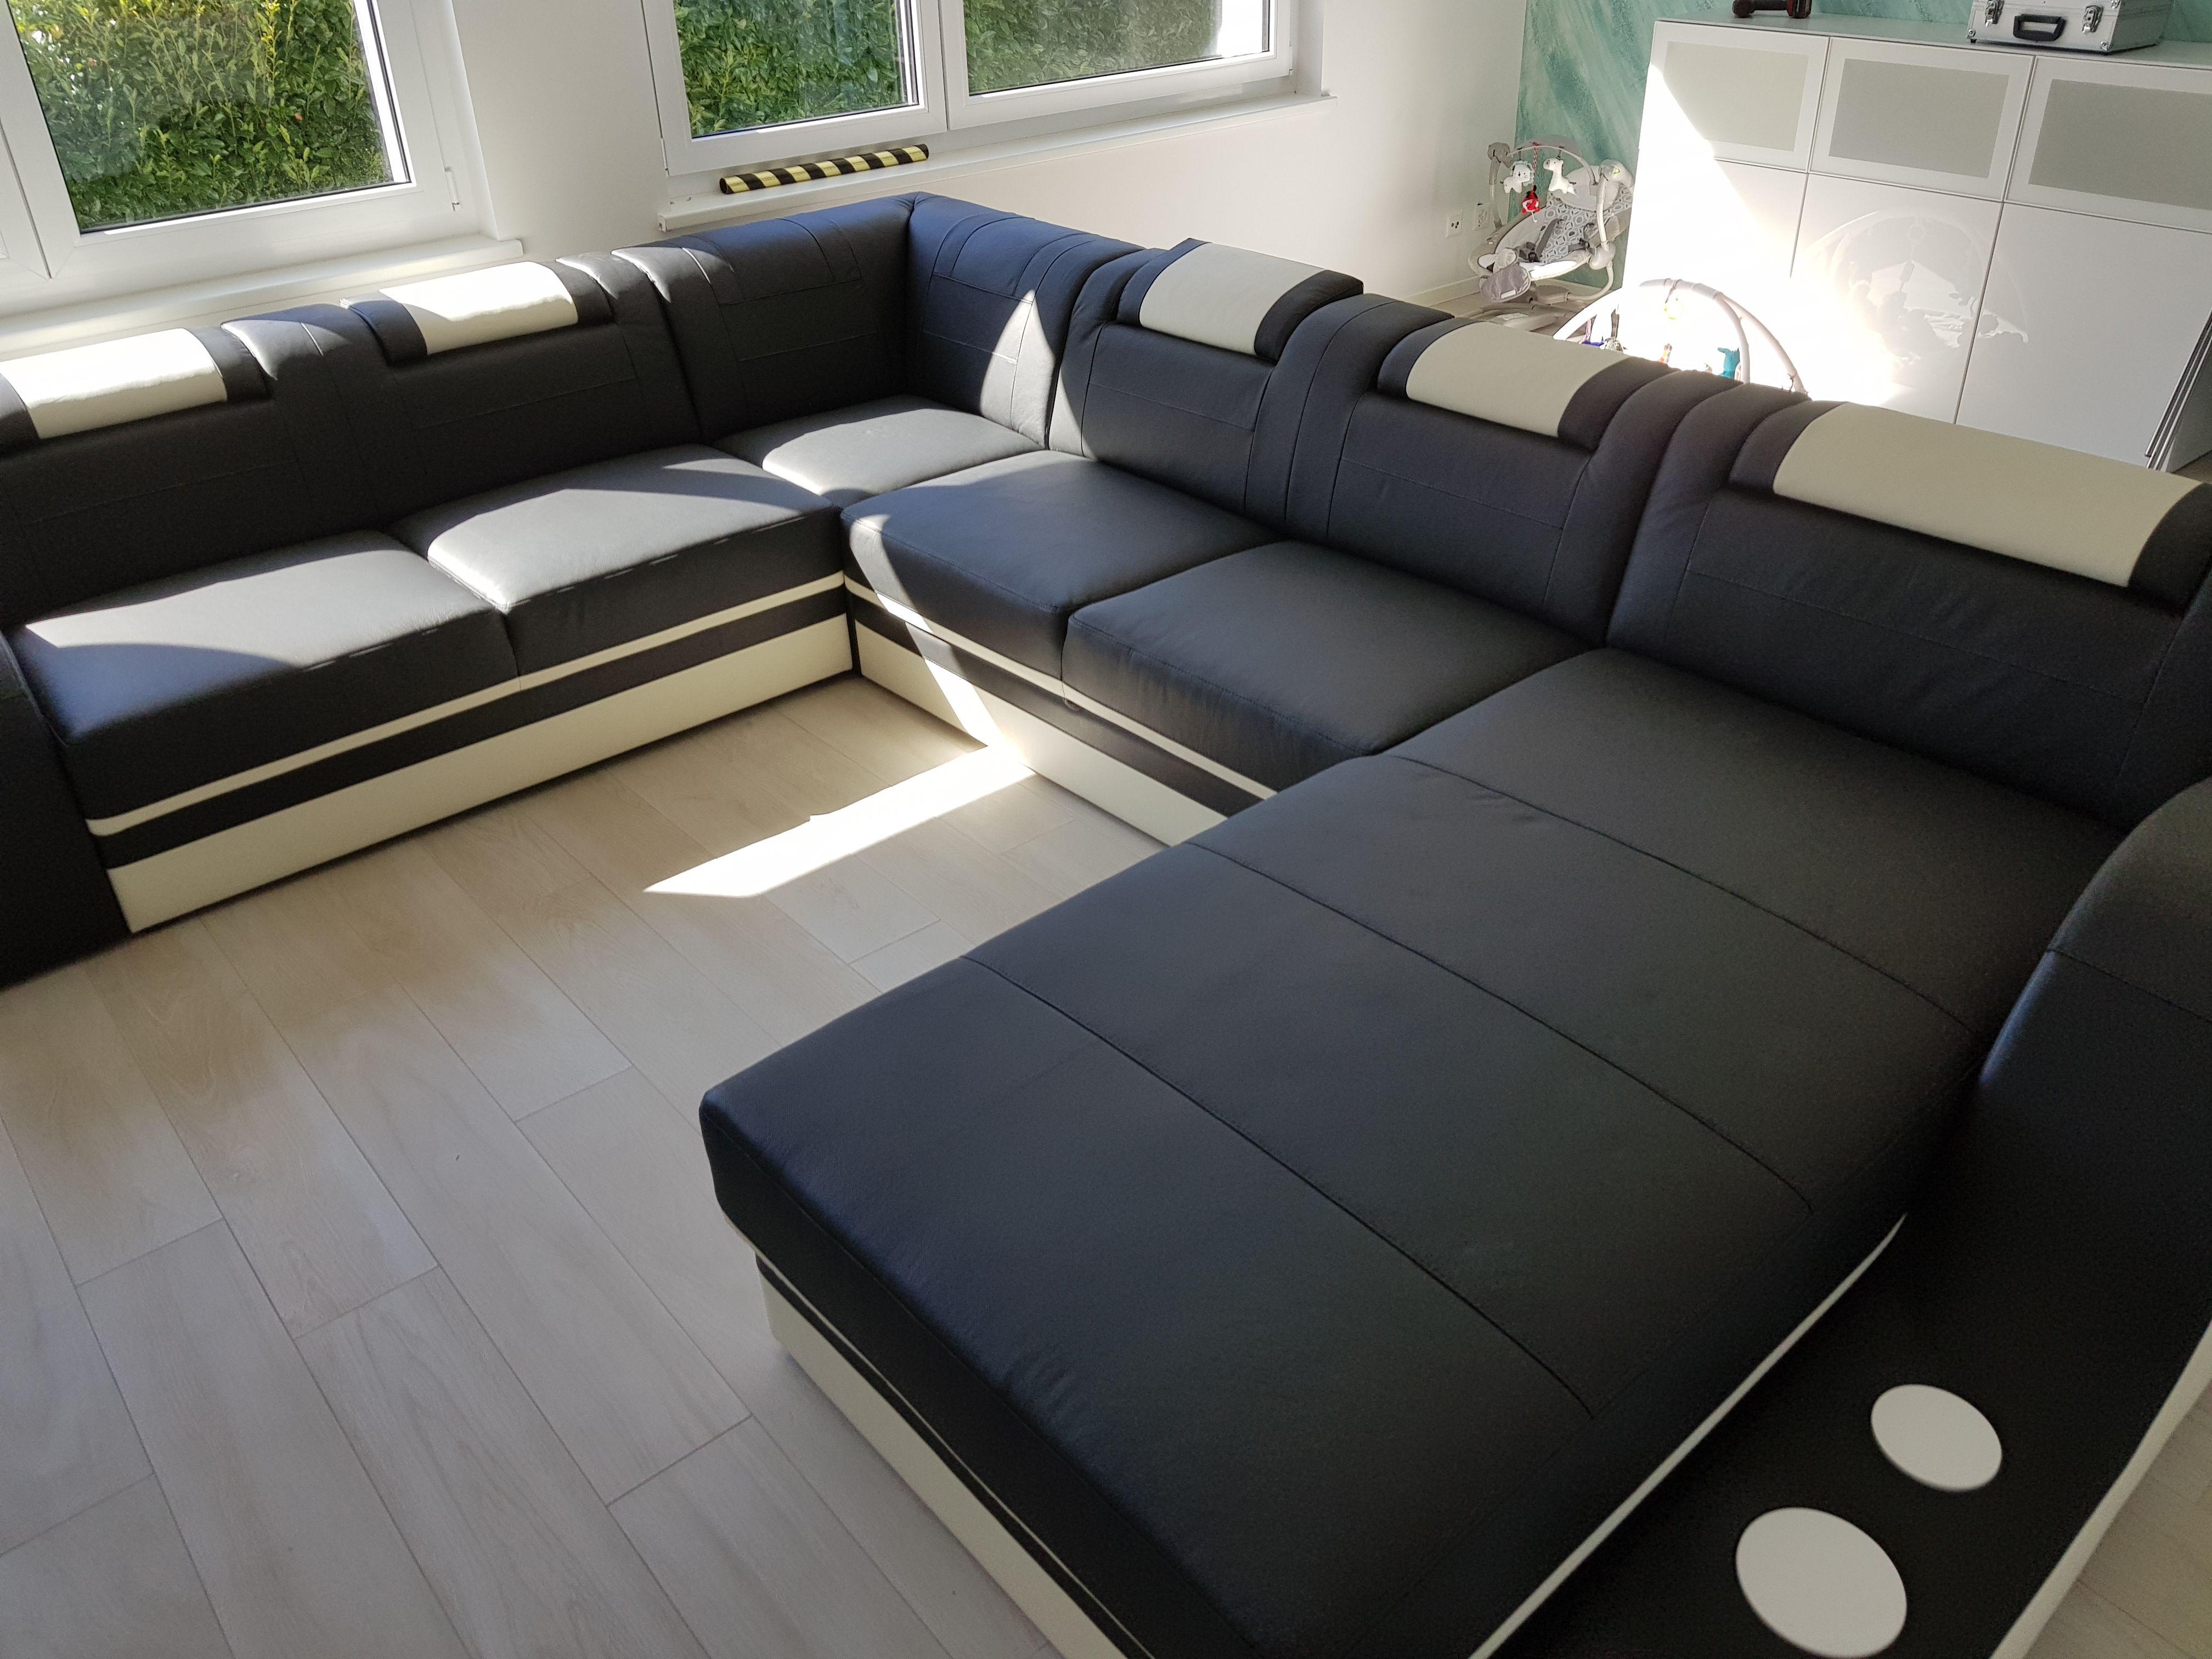 Divano moderno con led ultima design moderno divano a for Divano xxl conforama